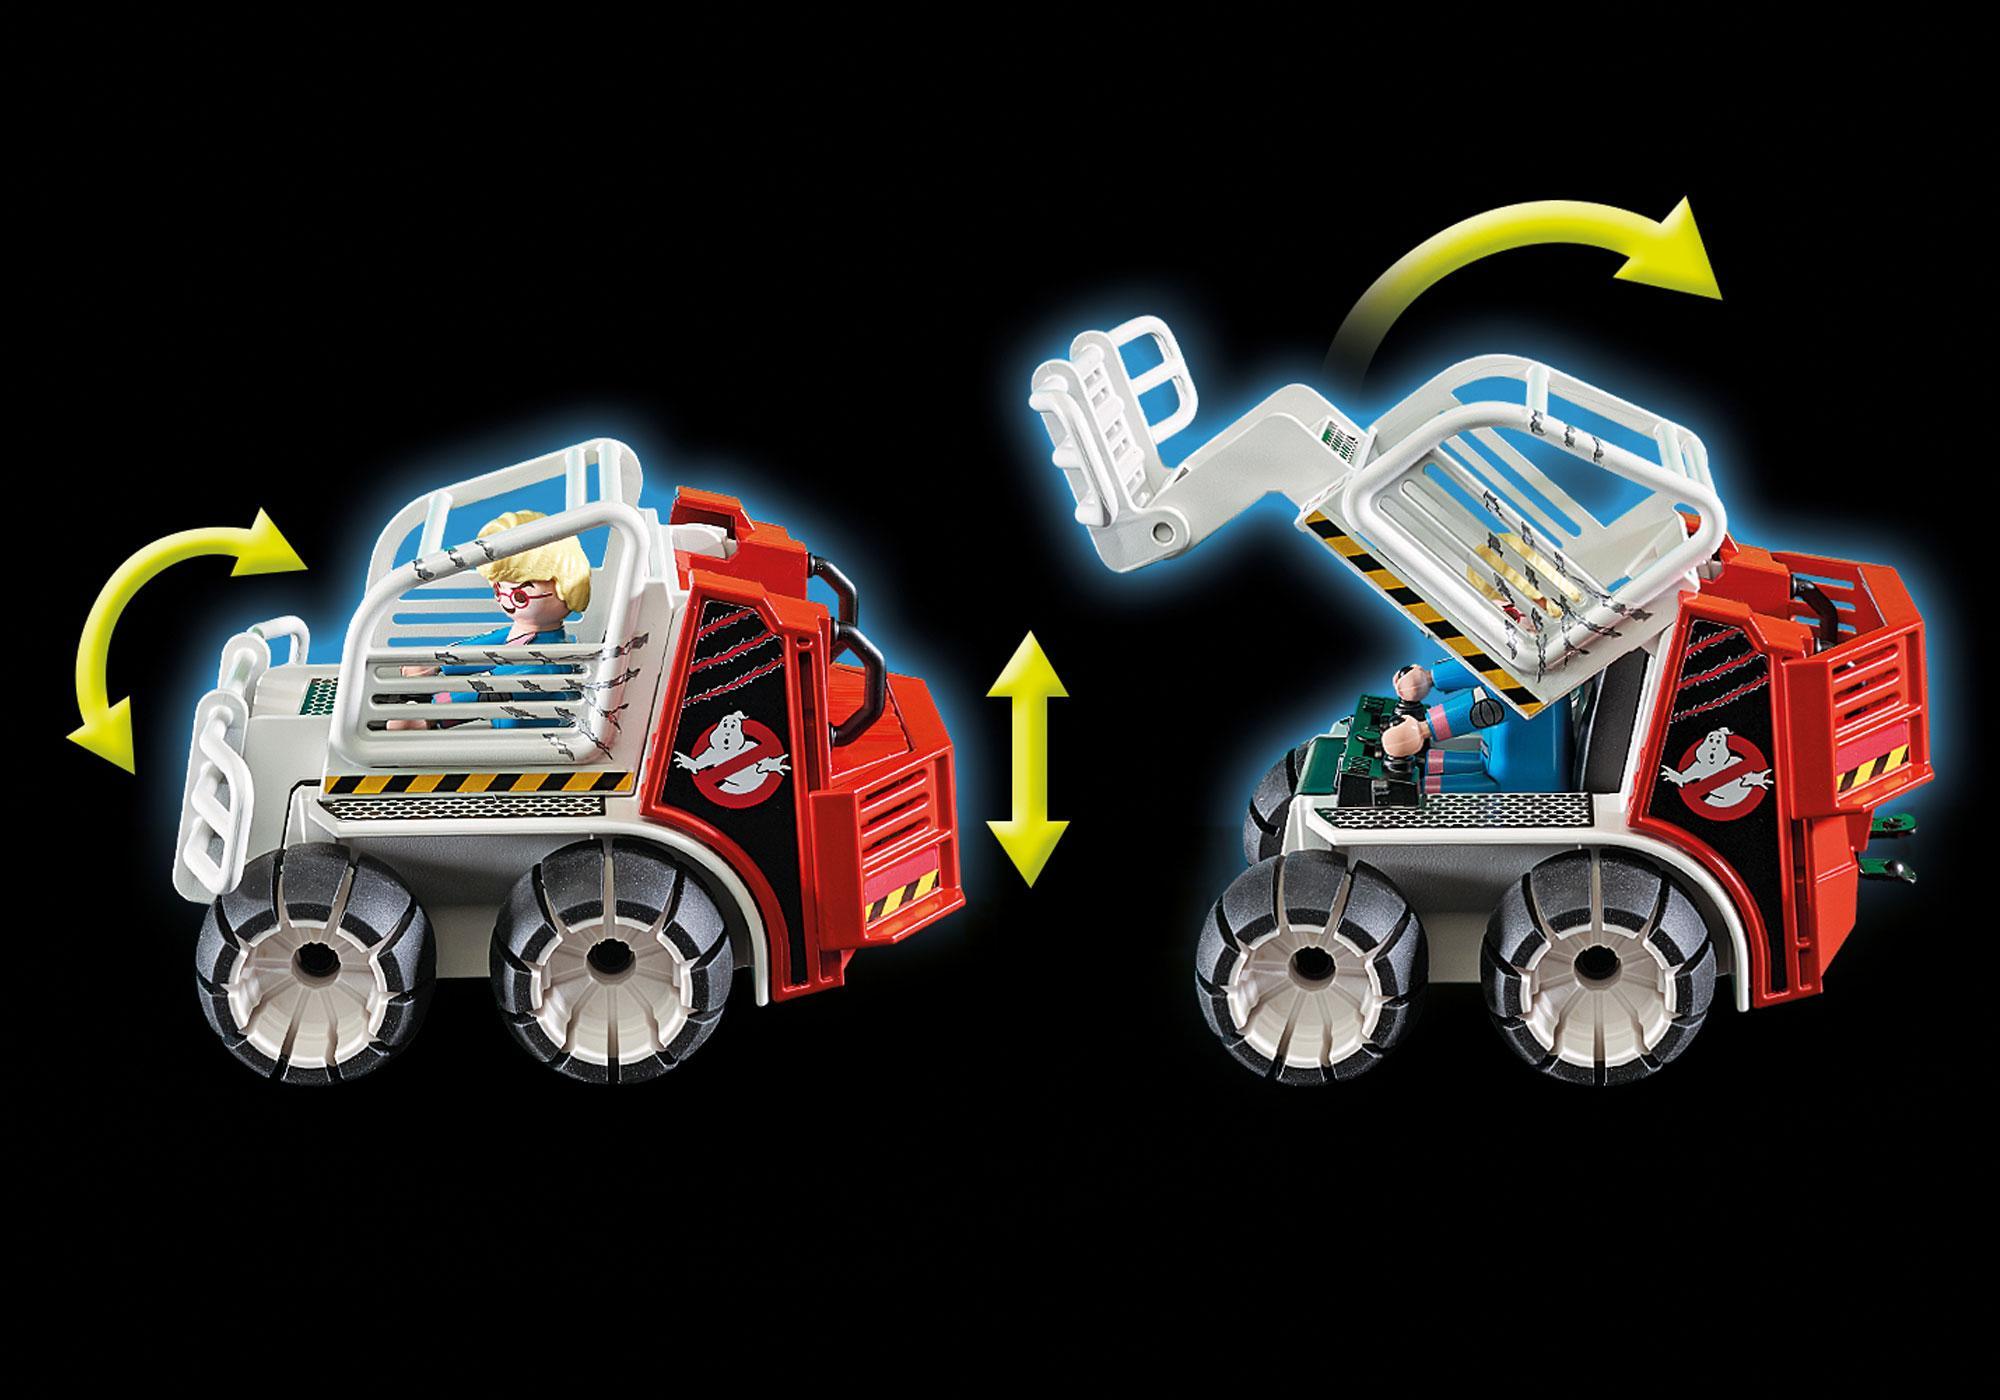 http://media.playmobil.com/i/playmobil/9386_product_extra1/Spengler con veicolo acchiappafantasmi